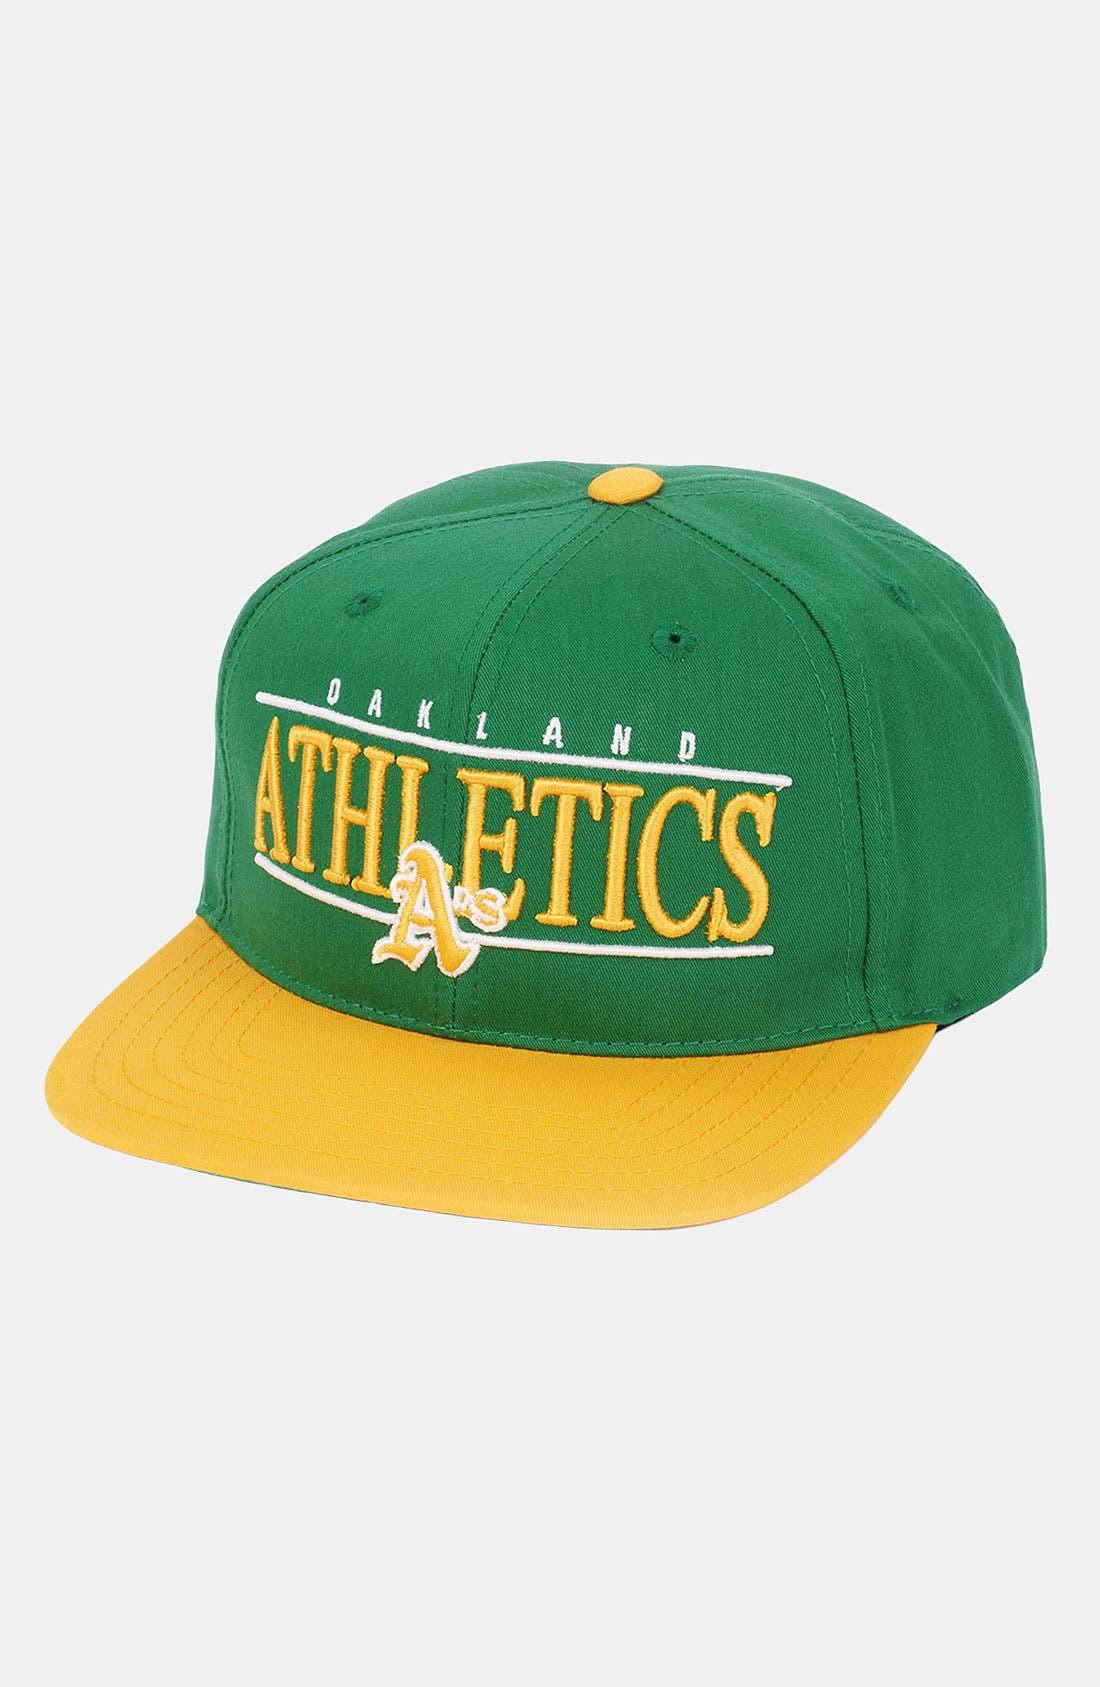 Main Image - American Needle 'Oakland Athletics - Nineties' Twill Snapback Baseball Cap